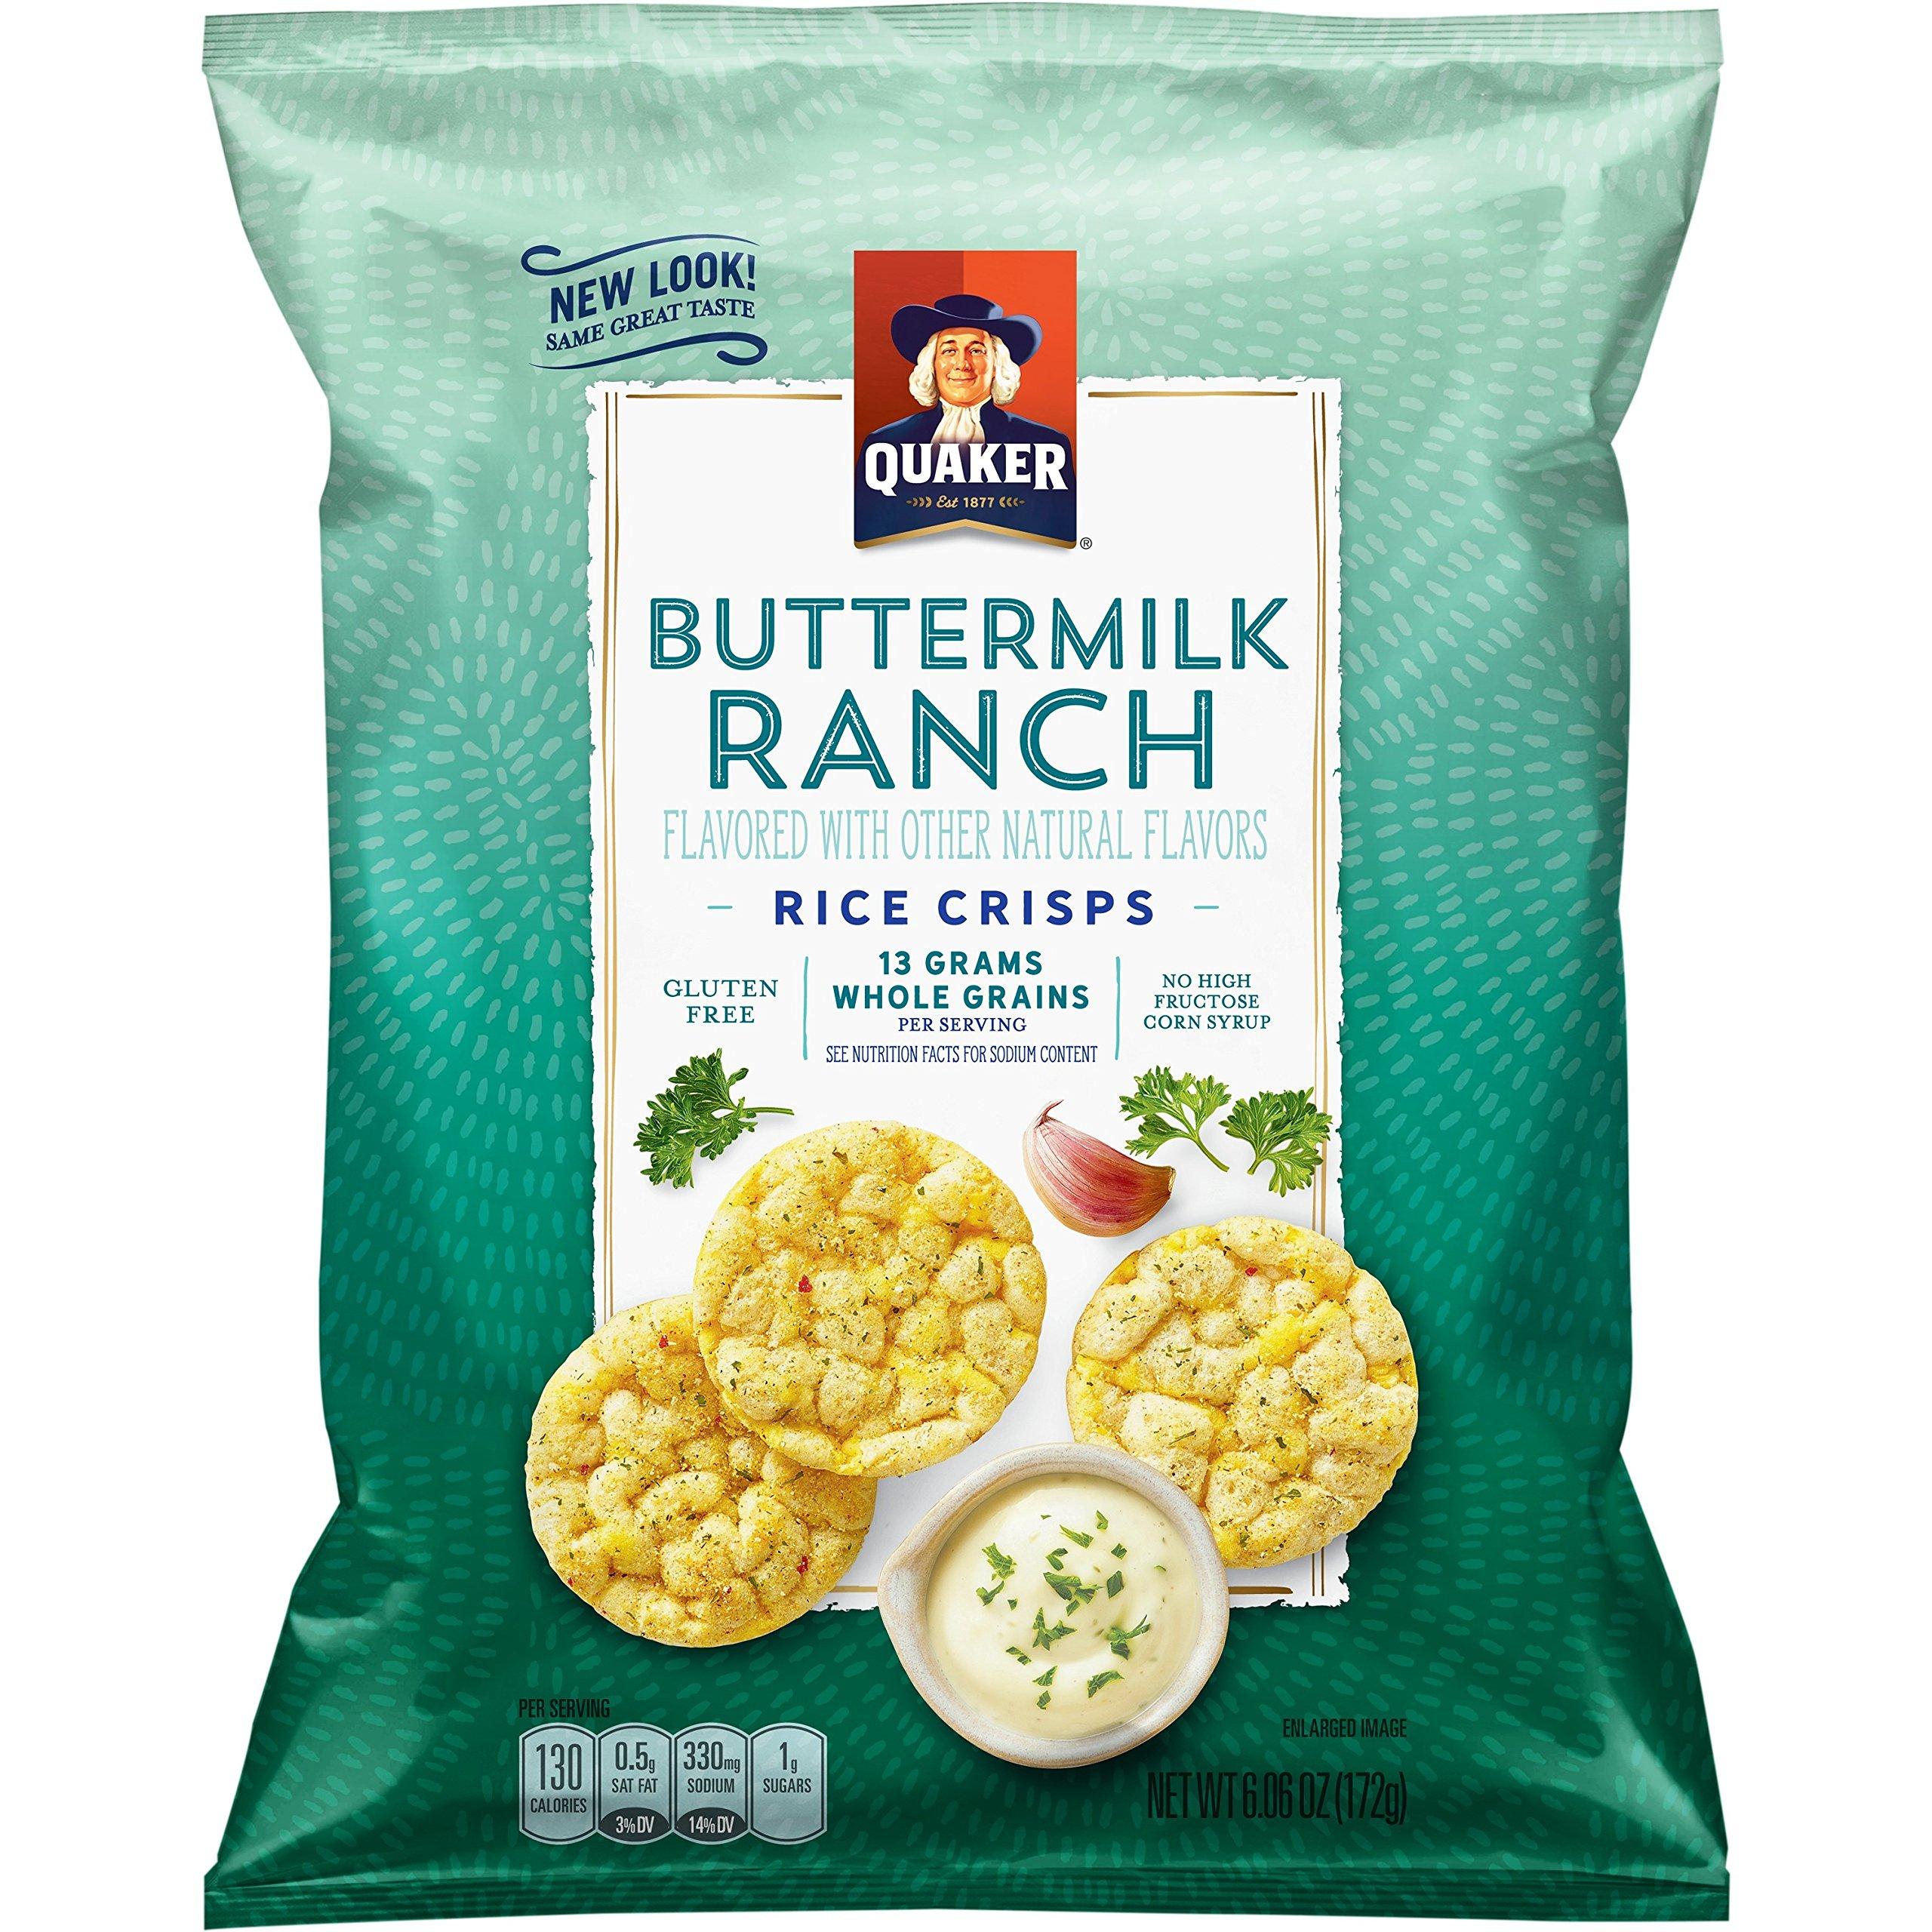 Quaker Rice Crisps, Gluten Free, Buttermilk Ranch, 6.06oz Bags, 6 Count by Quaker